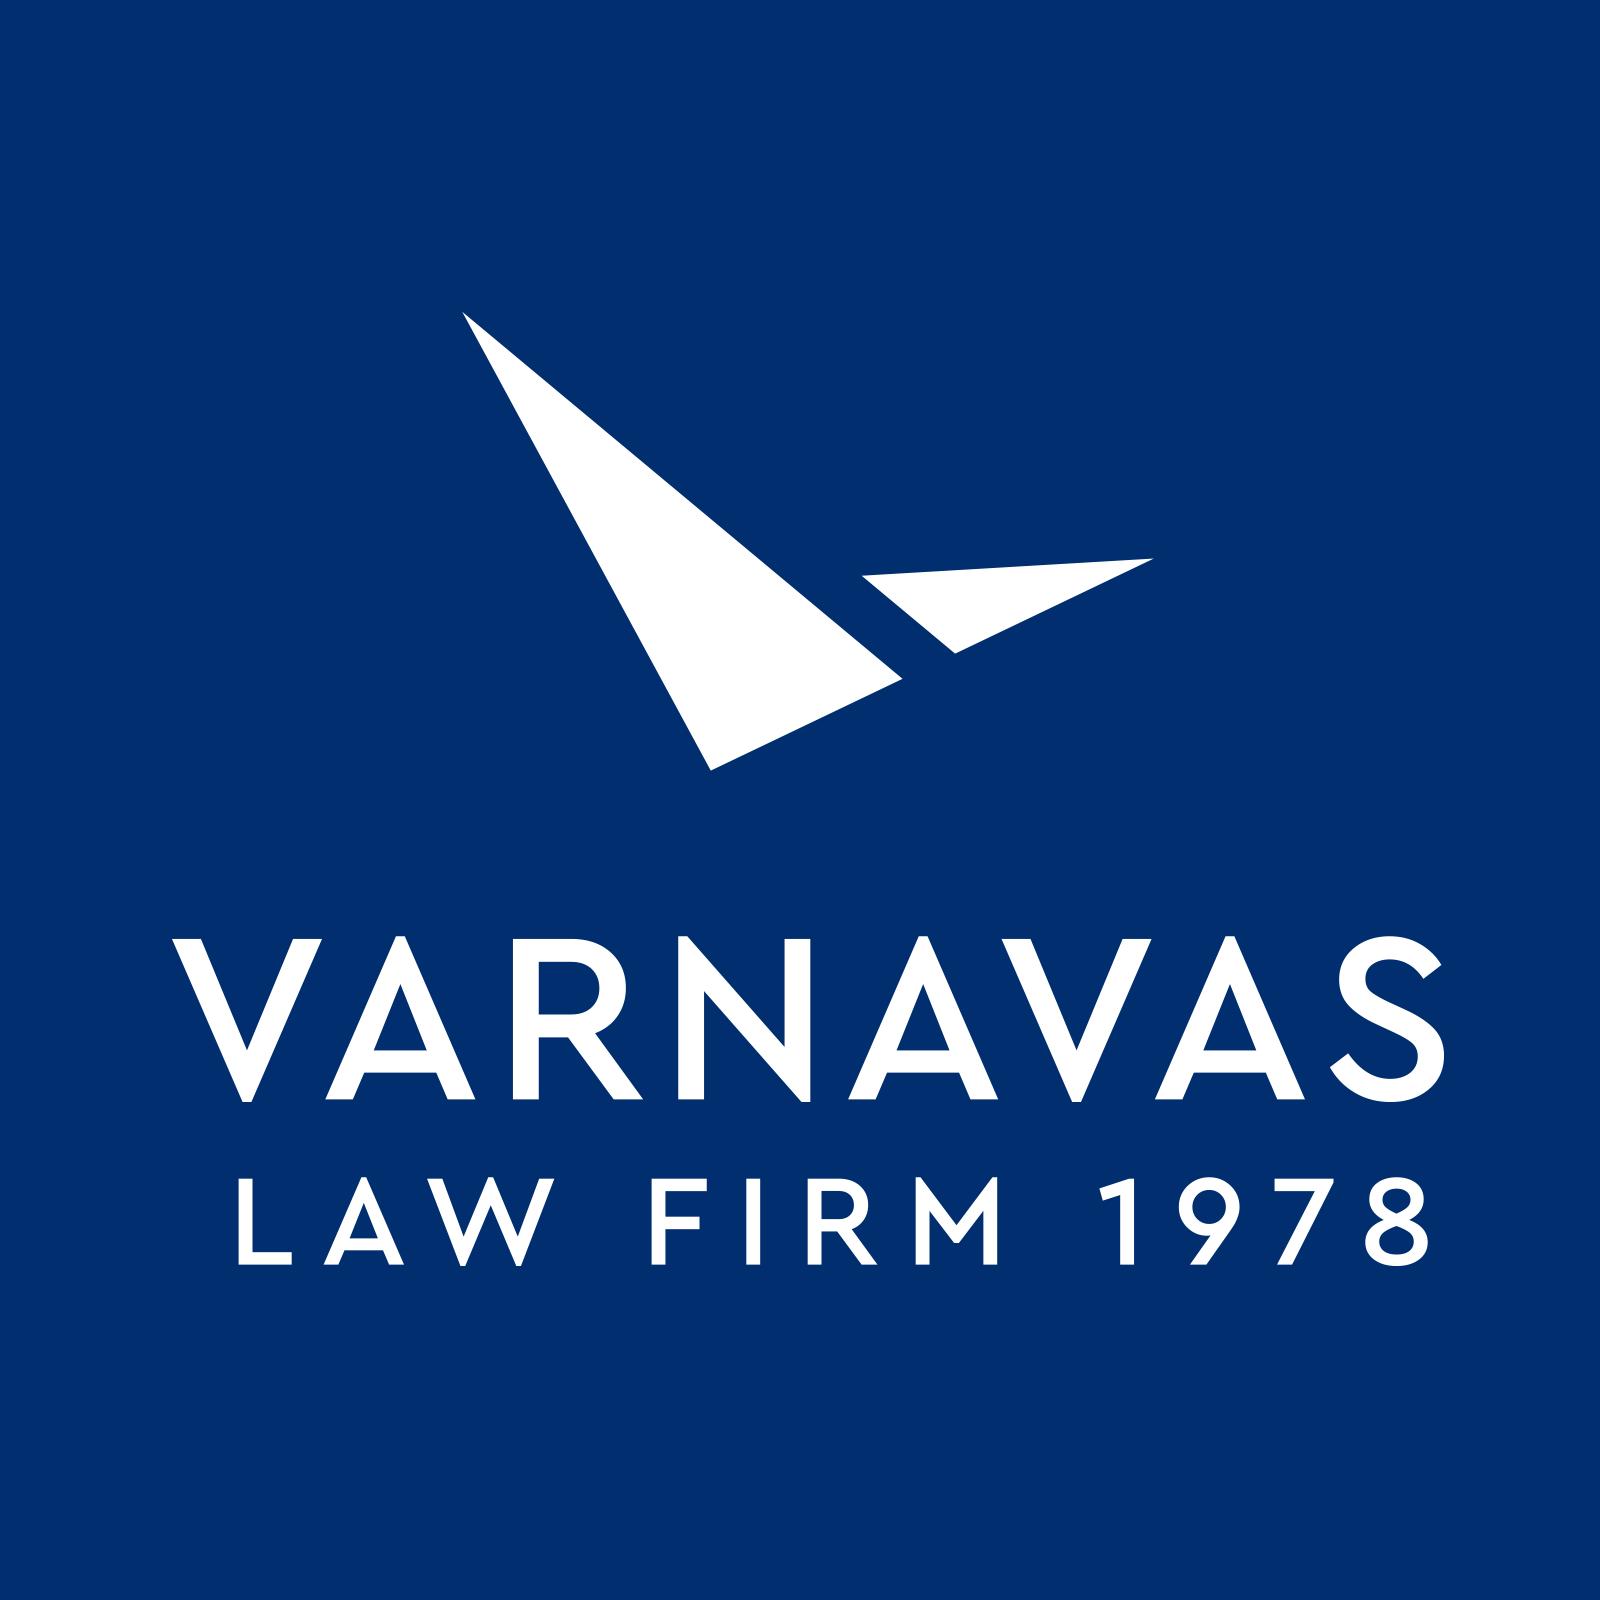 Varnavas Law Firm 1978 logo